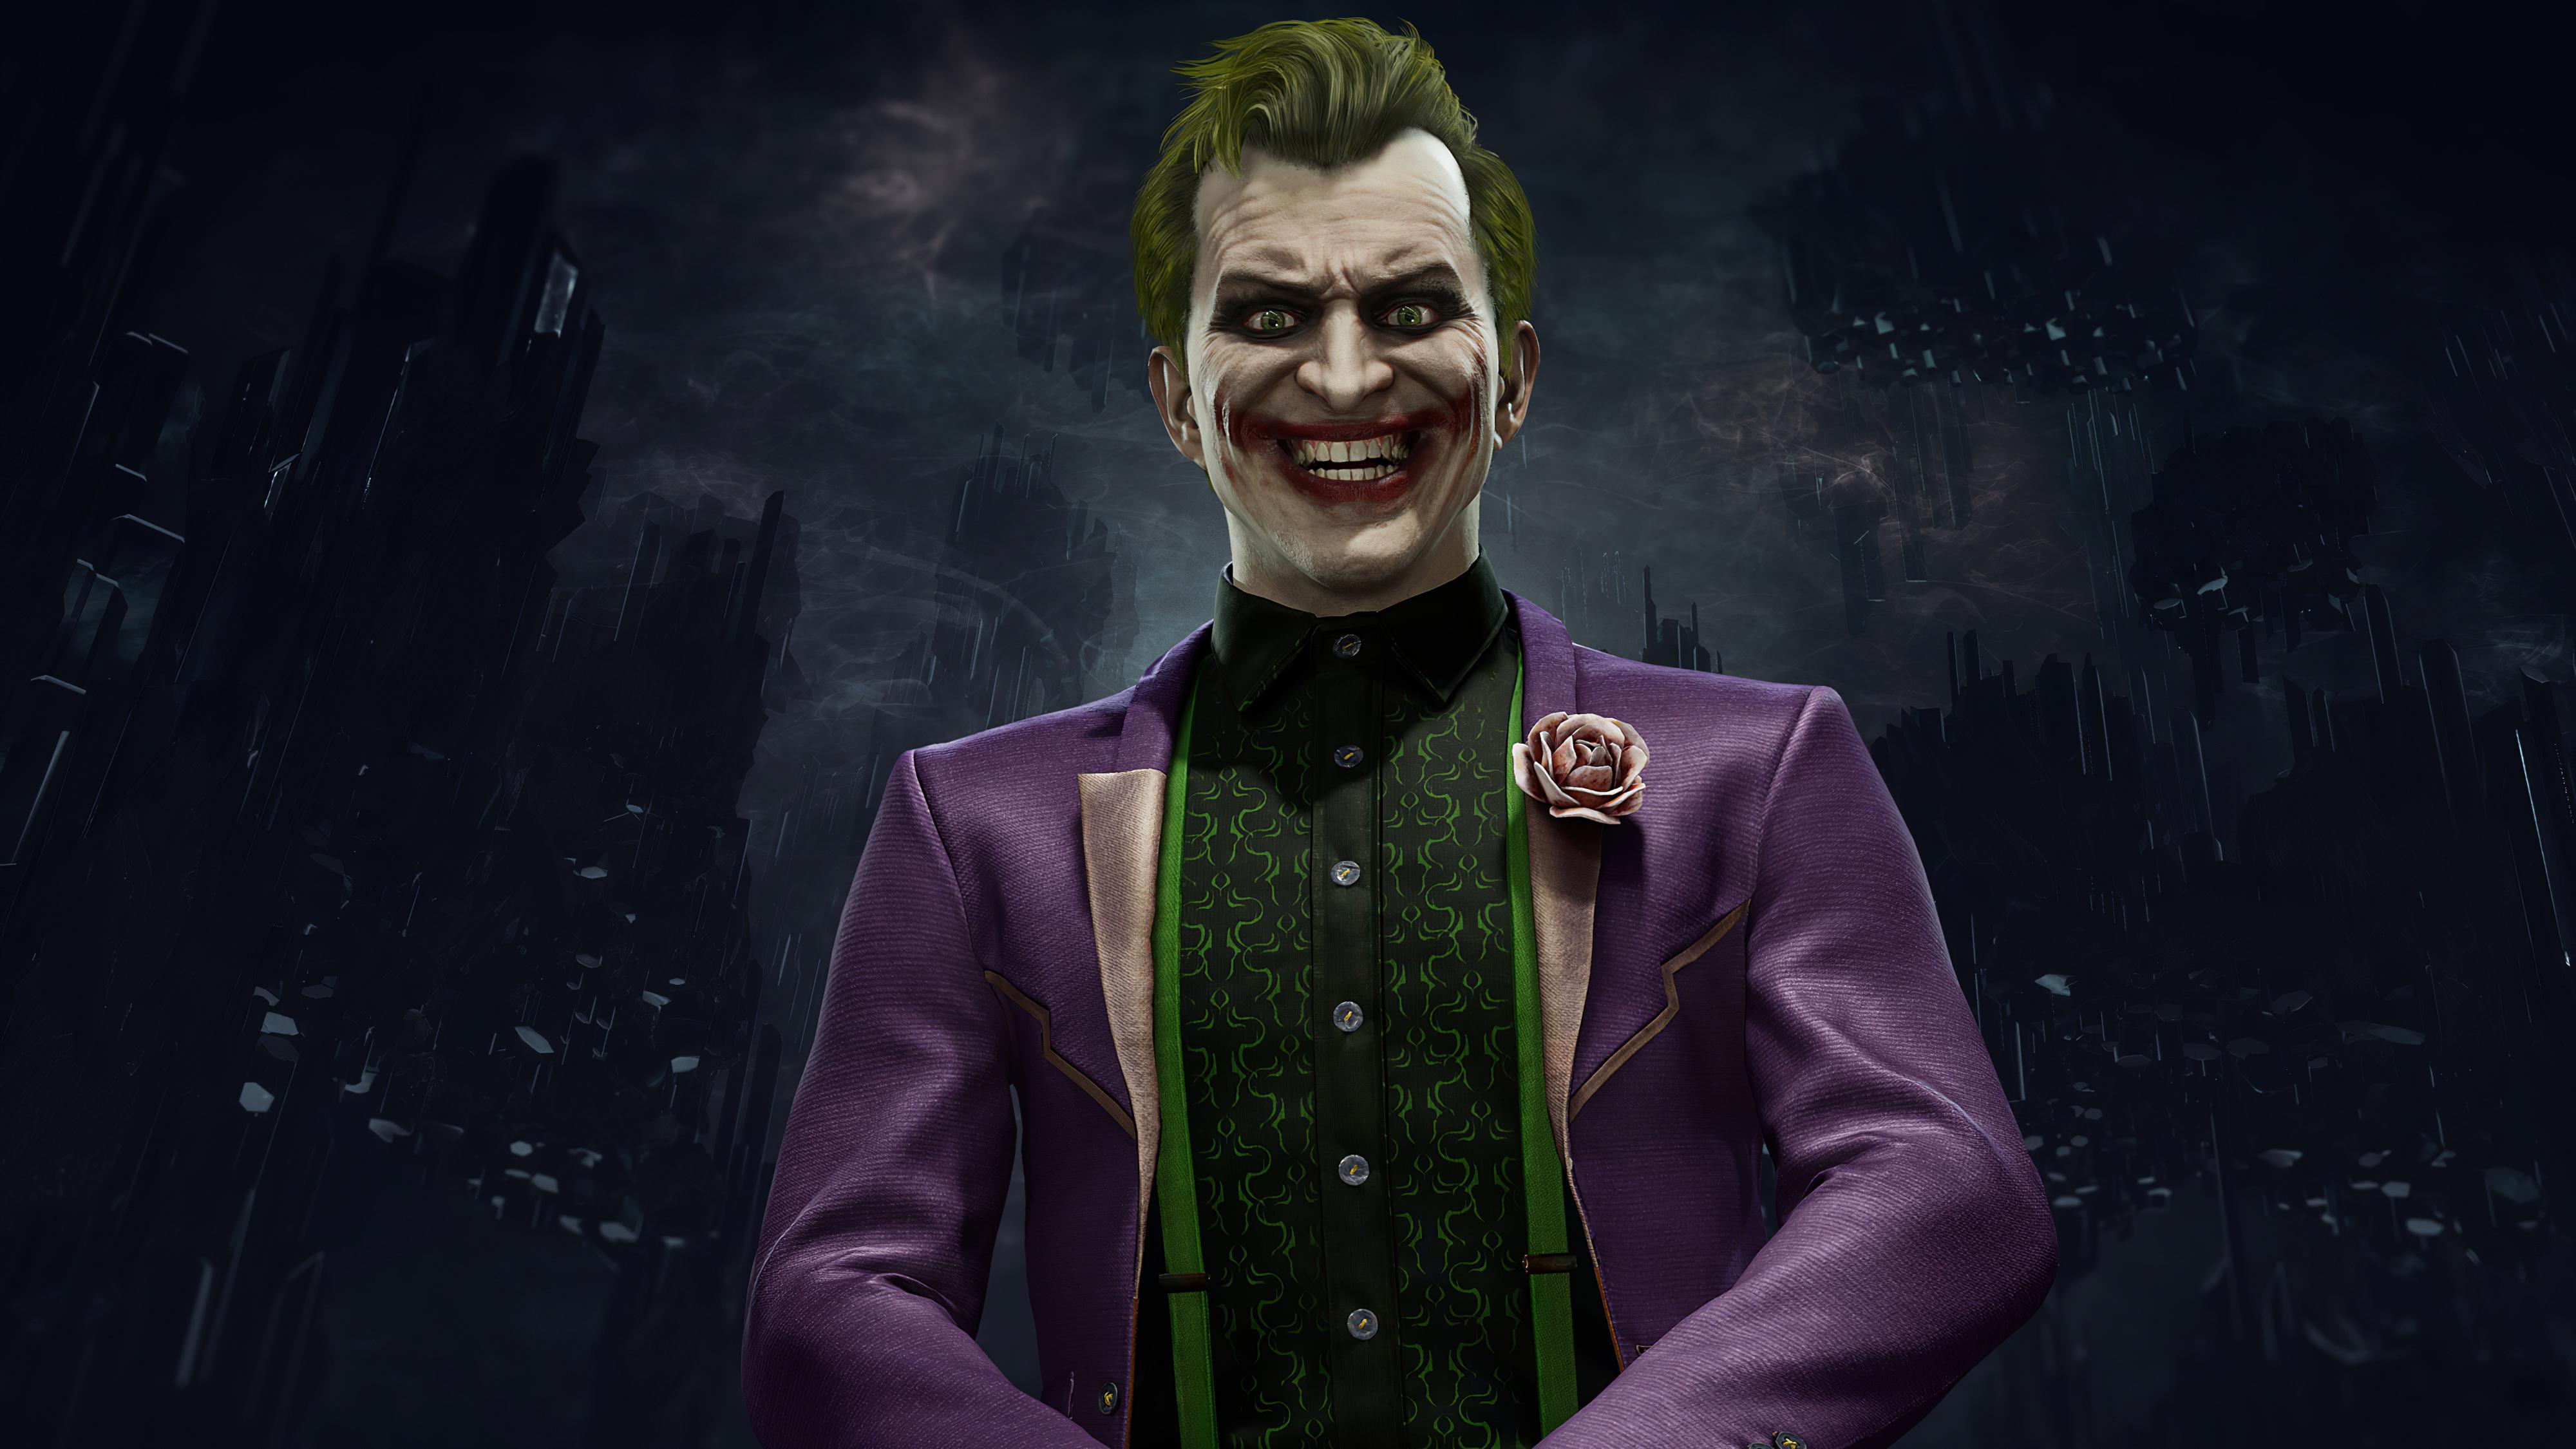 Joker In Mortal Kombat 11 2020 Hd Games 4k Wallpapers Images